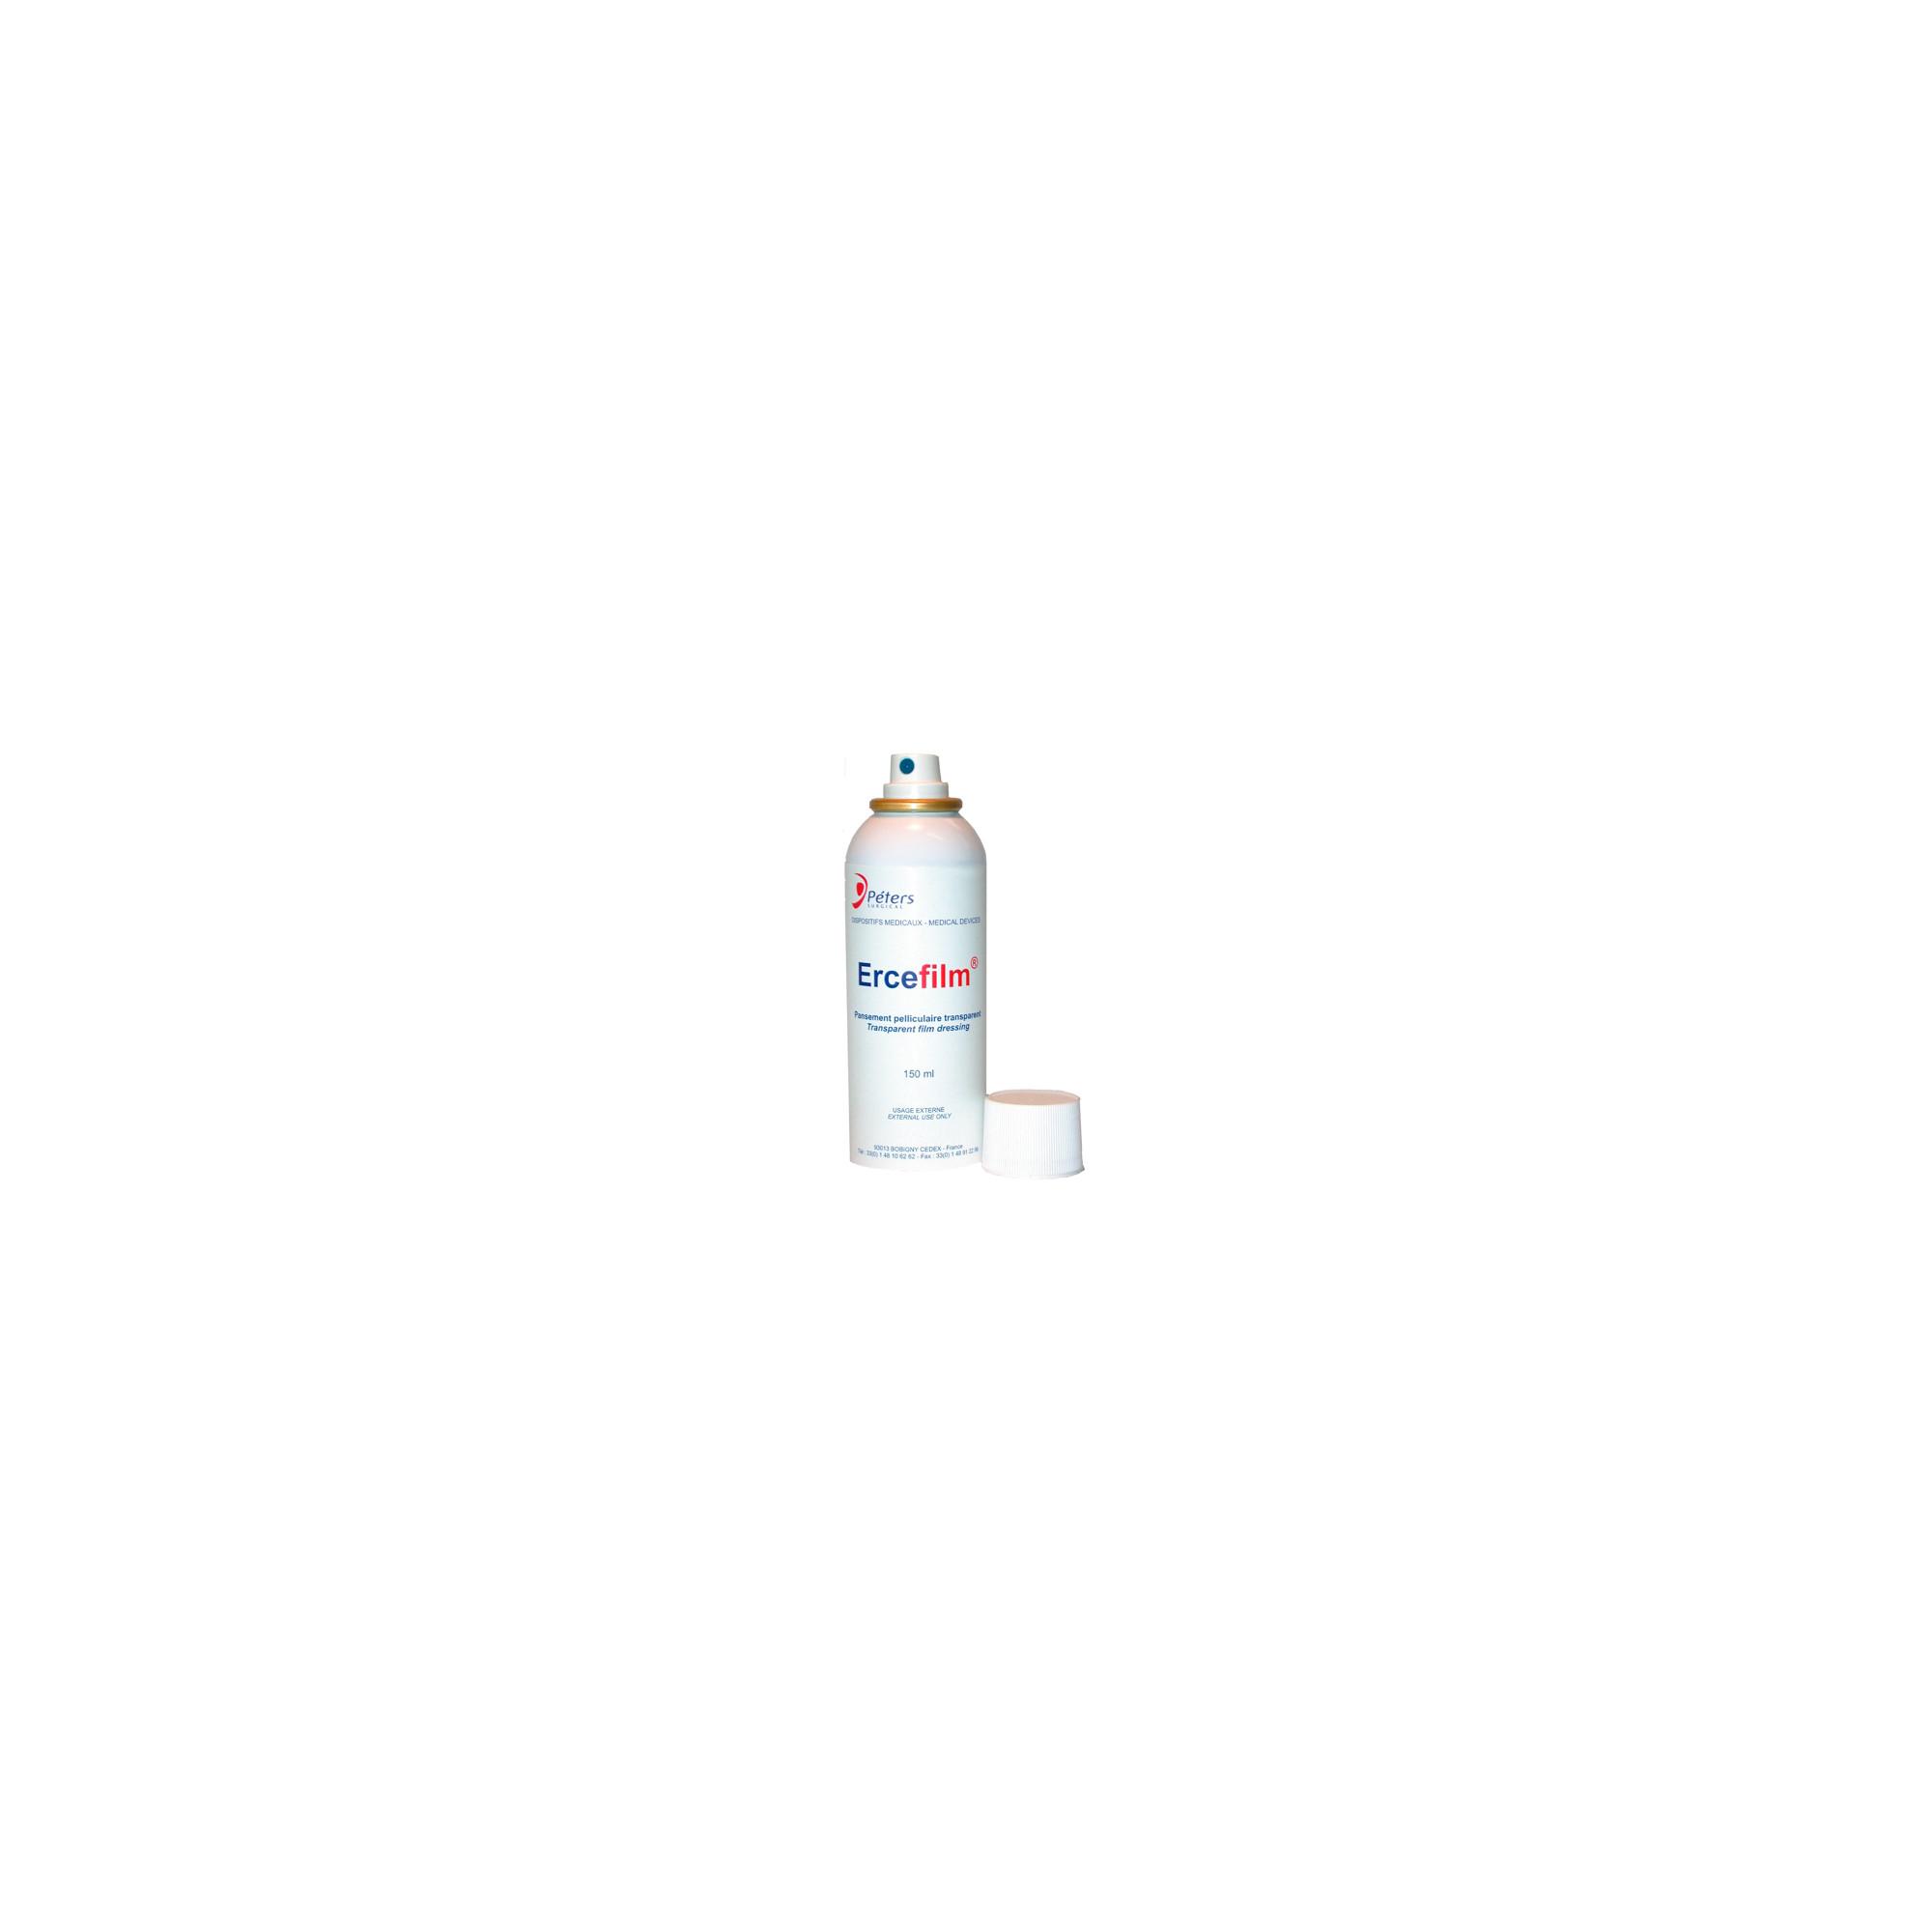 Pansement pelliculaire Ercefilm - 150 ml